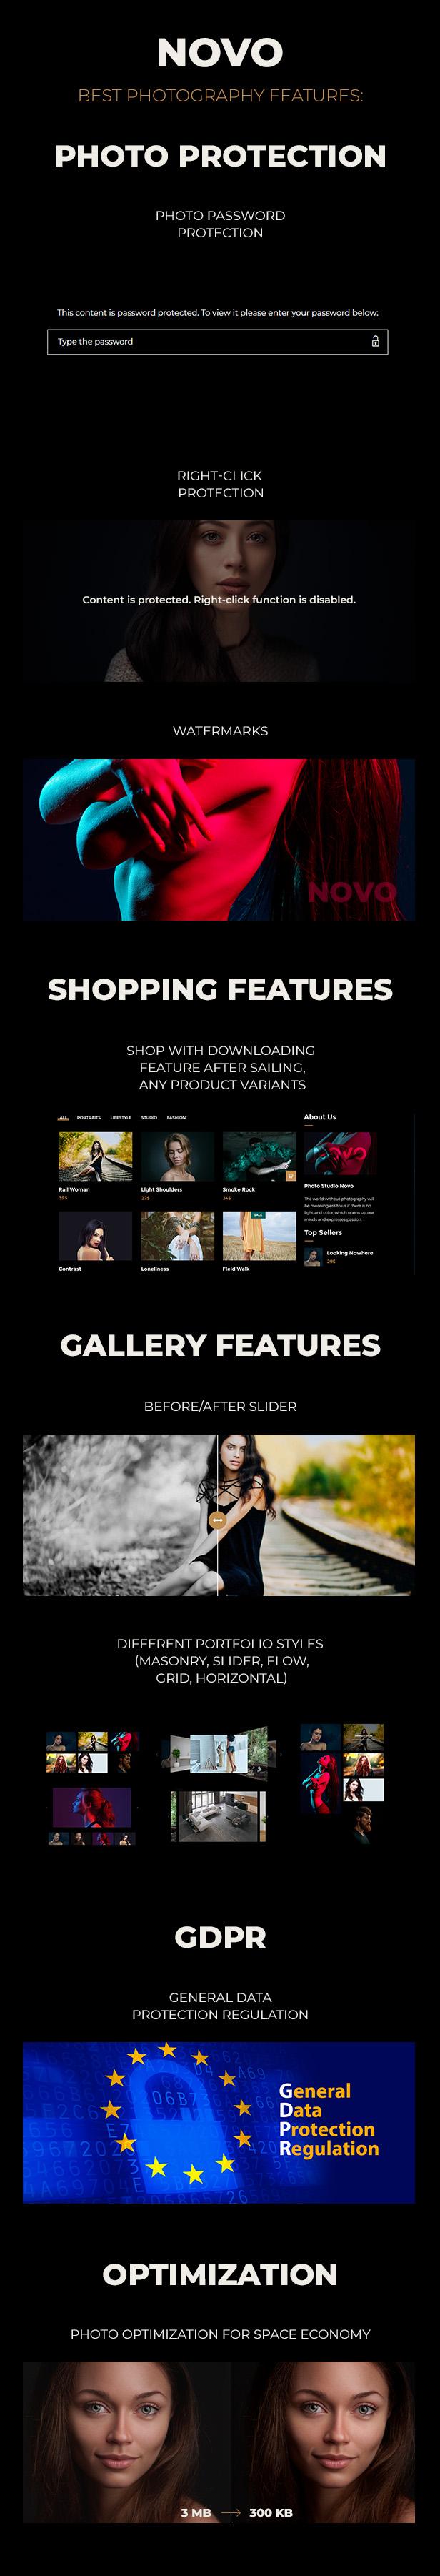 Photography Novo | Photography WordPress for Photography - 5